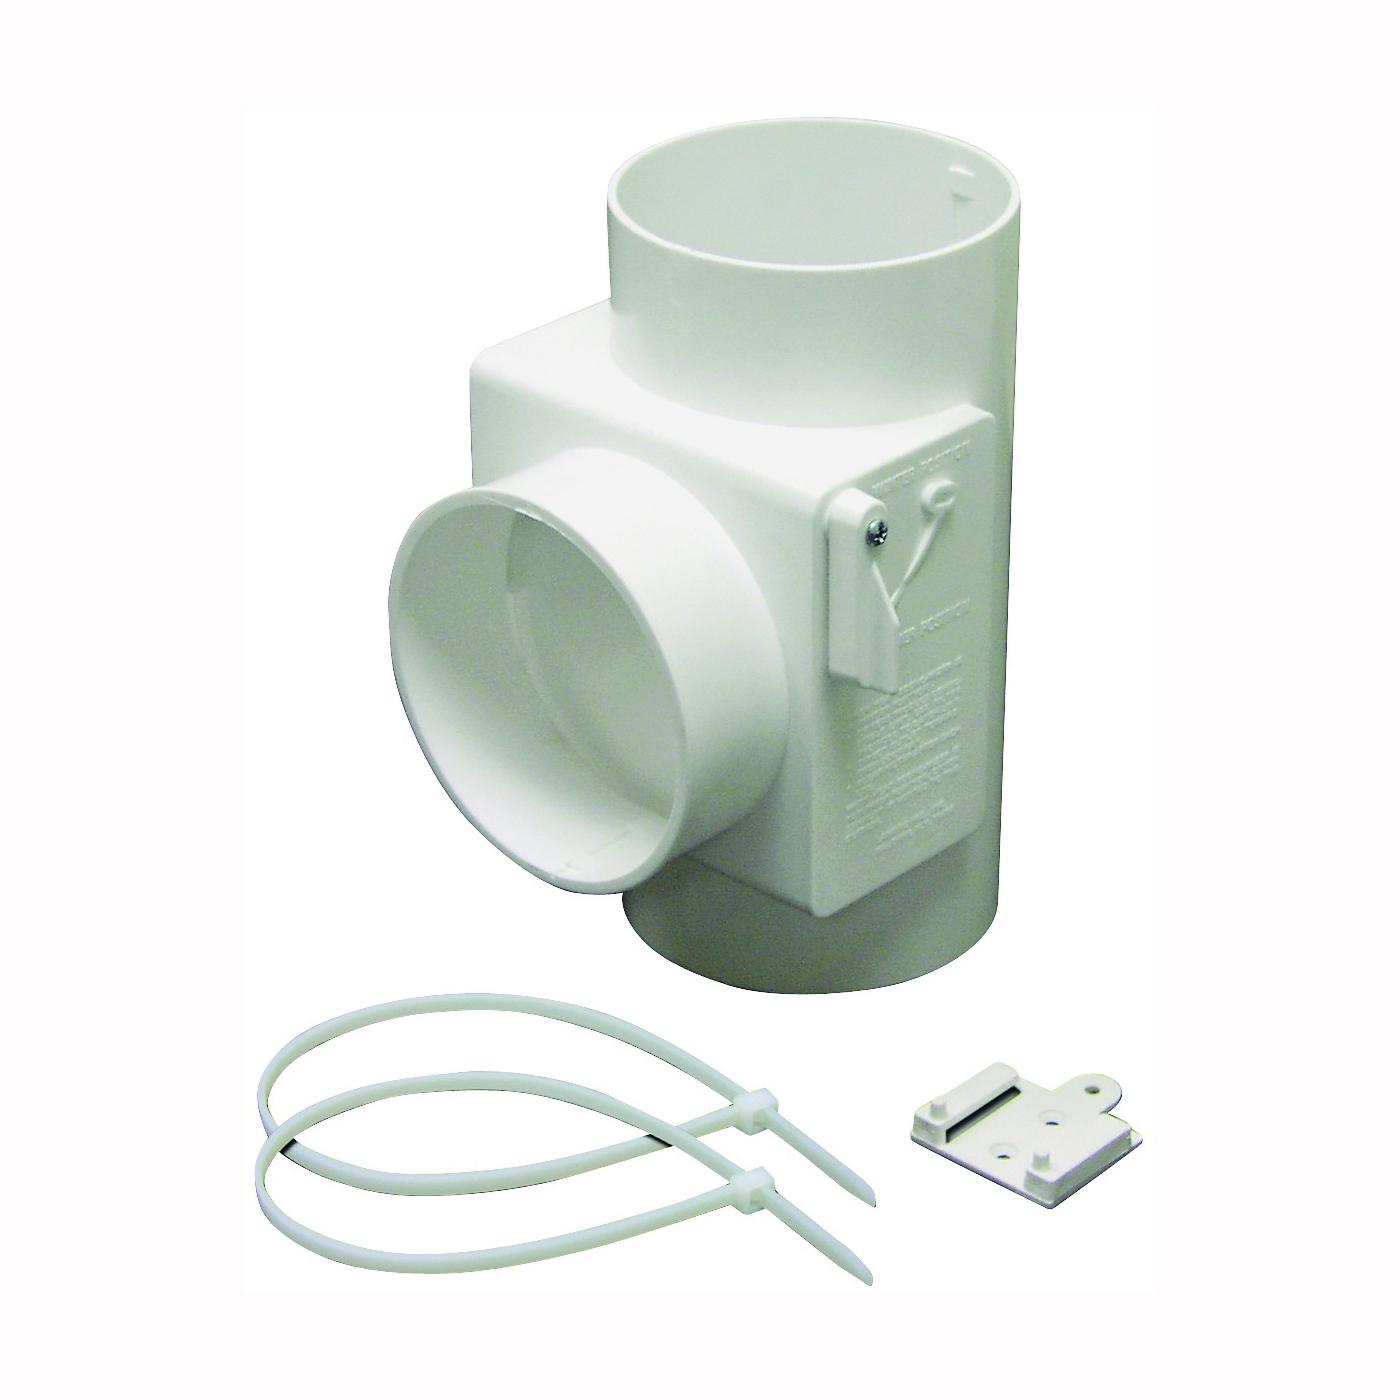 Picture of Lambro 1700 Heat Economizer